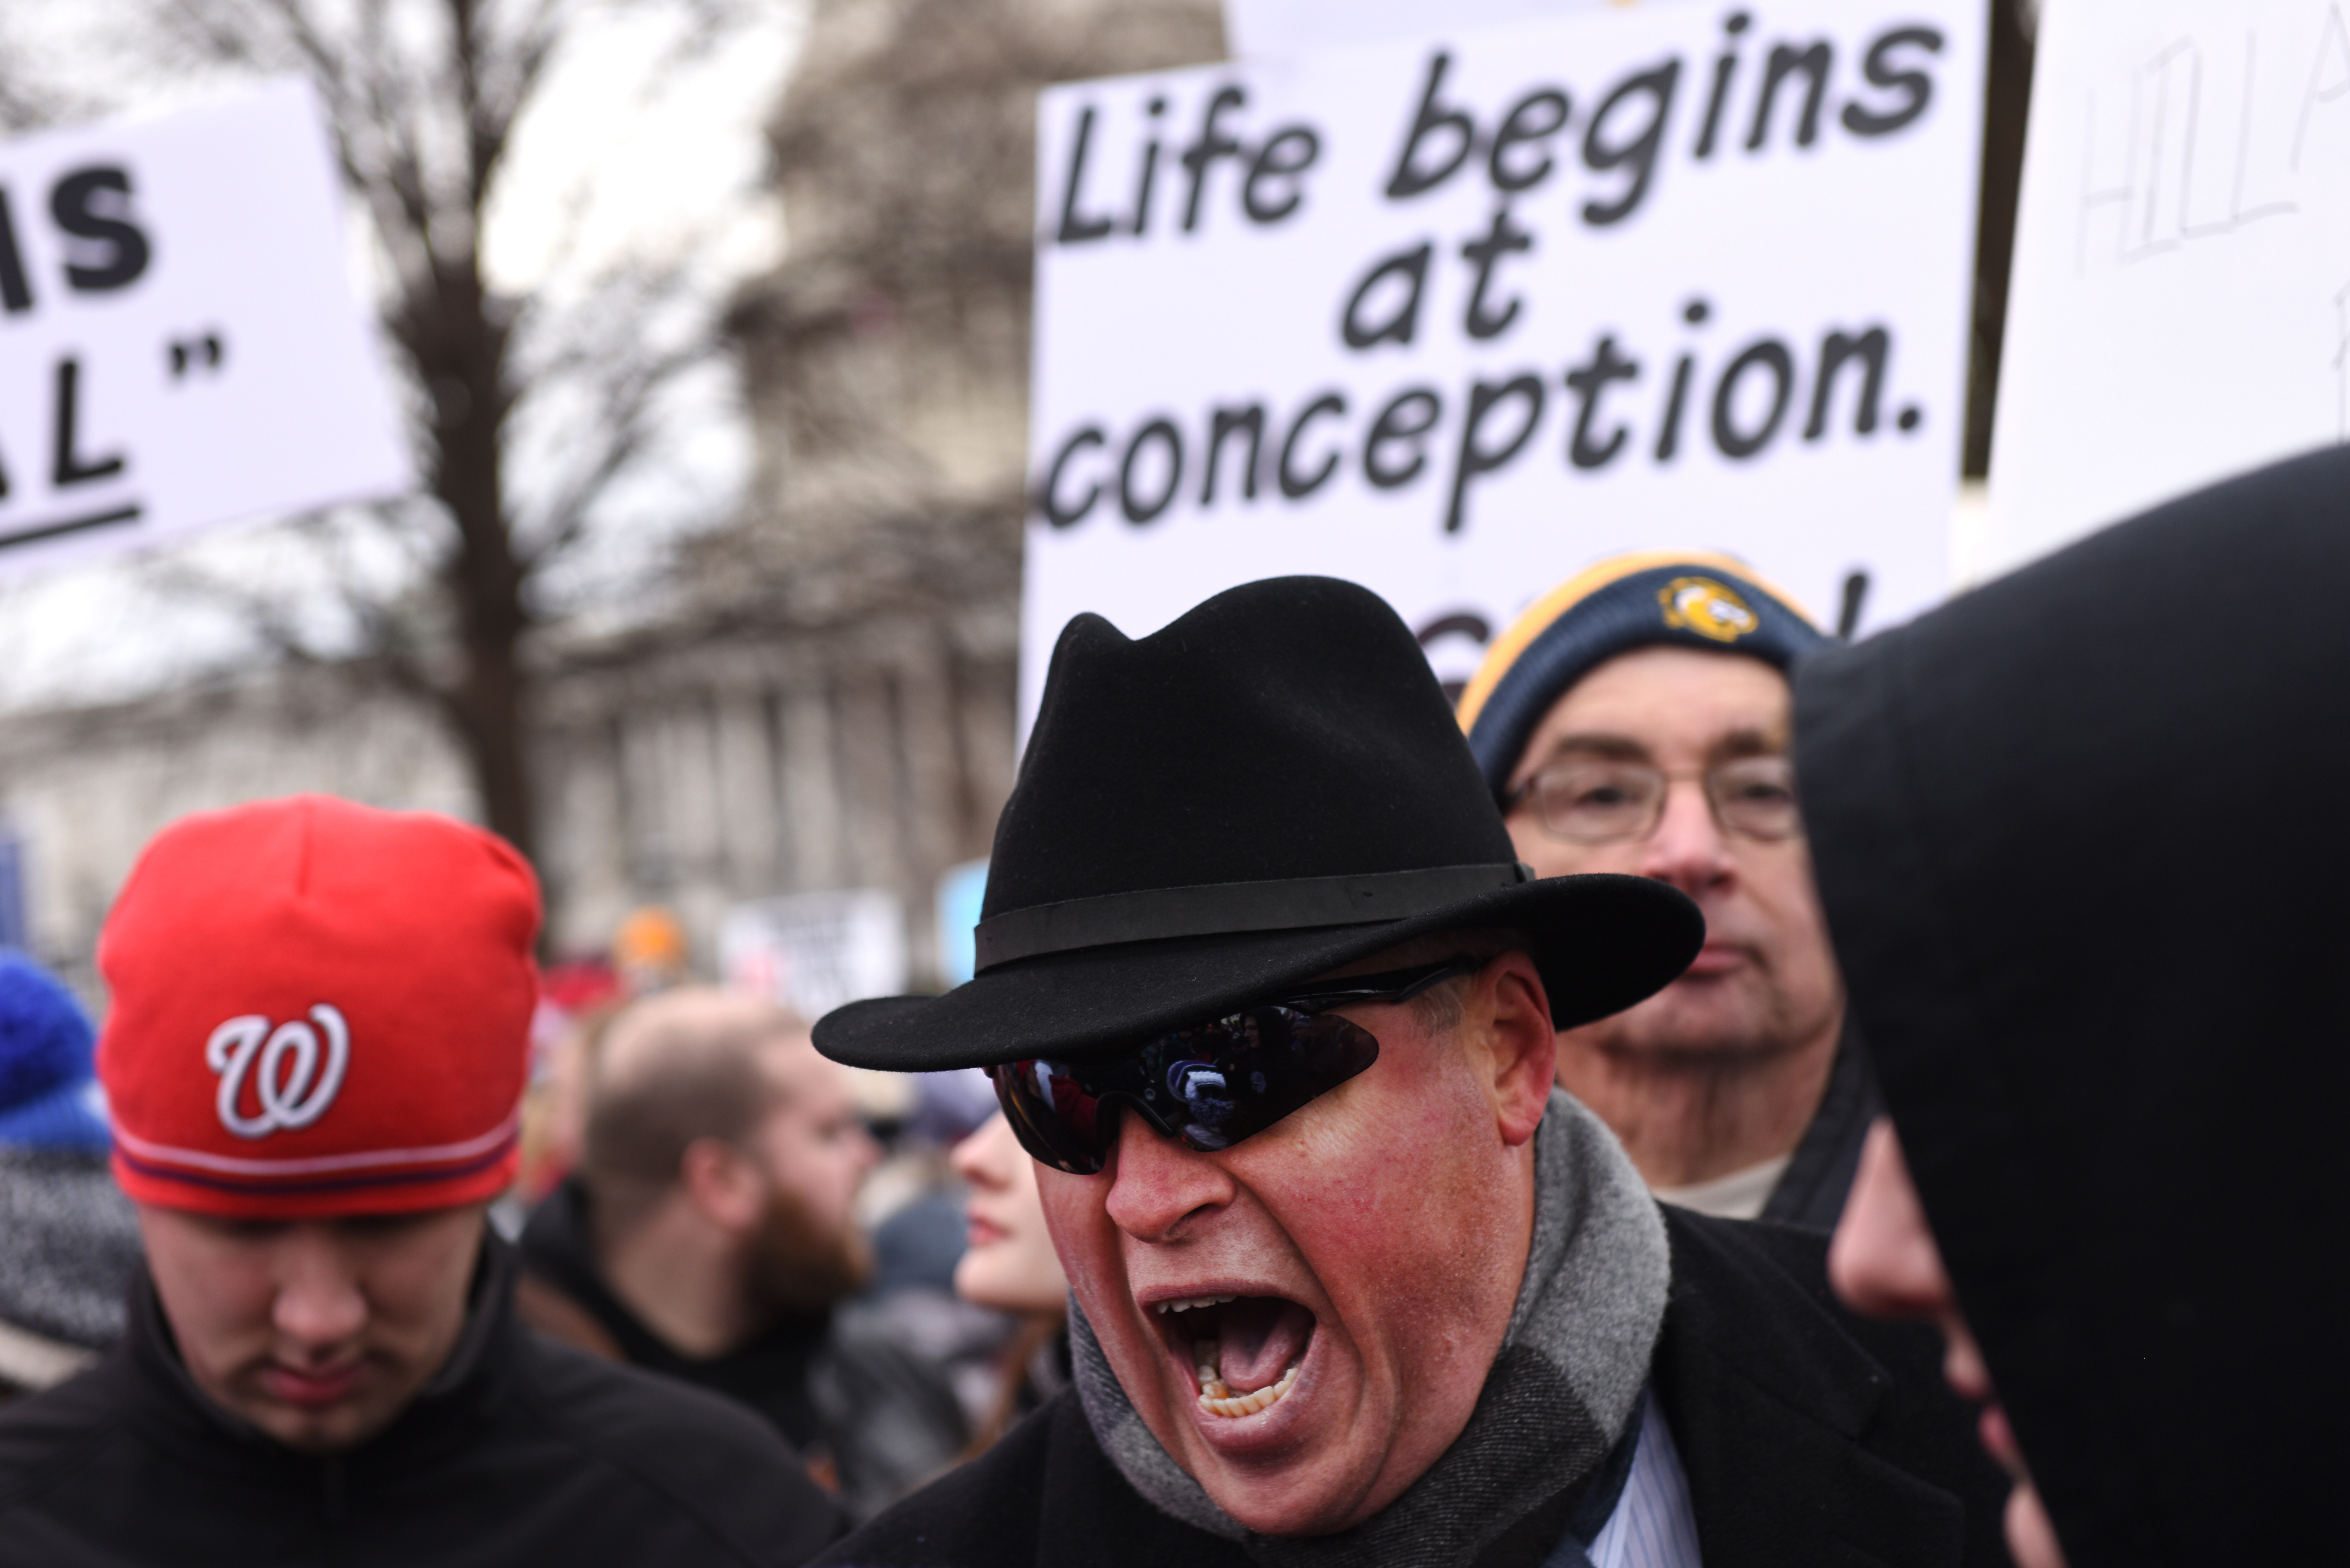 WASHINGTON DC - JANUARY 27: An abortion opponent yells at a pro